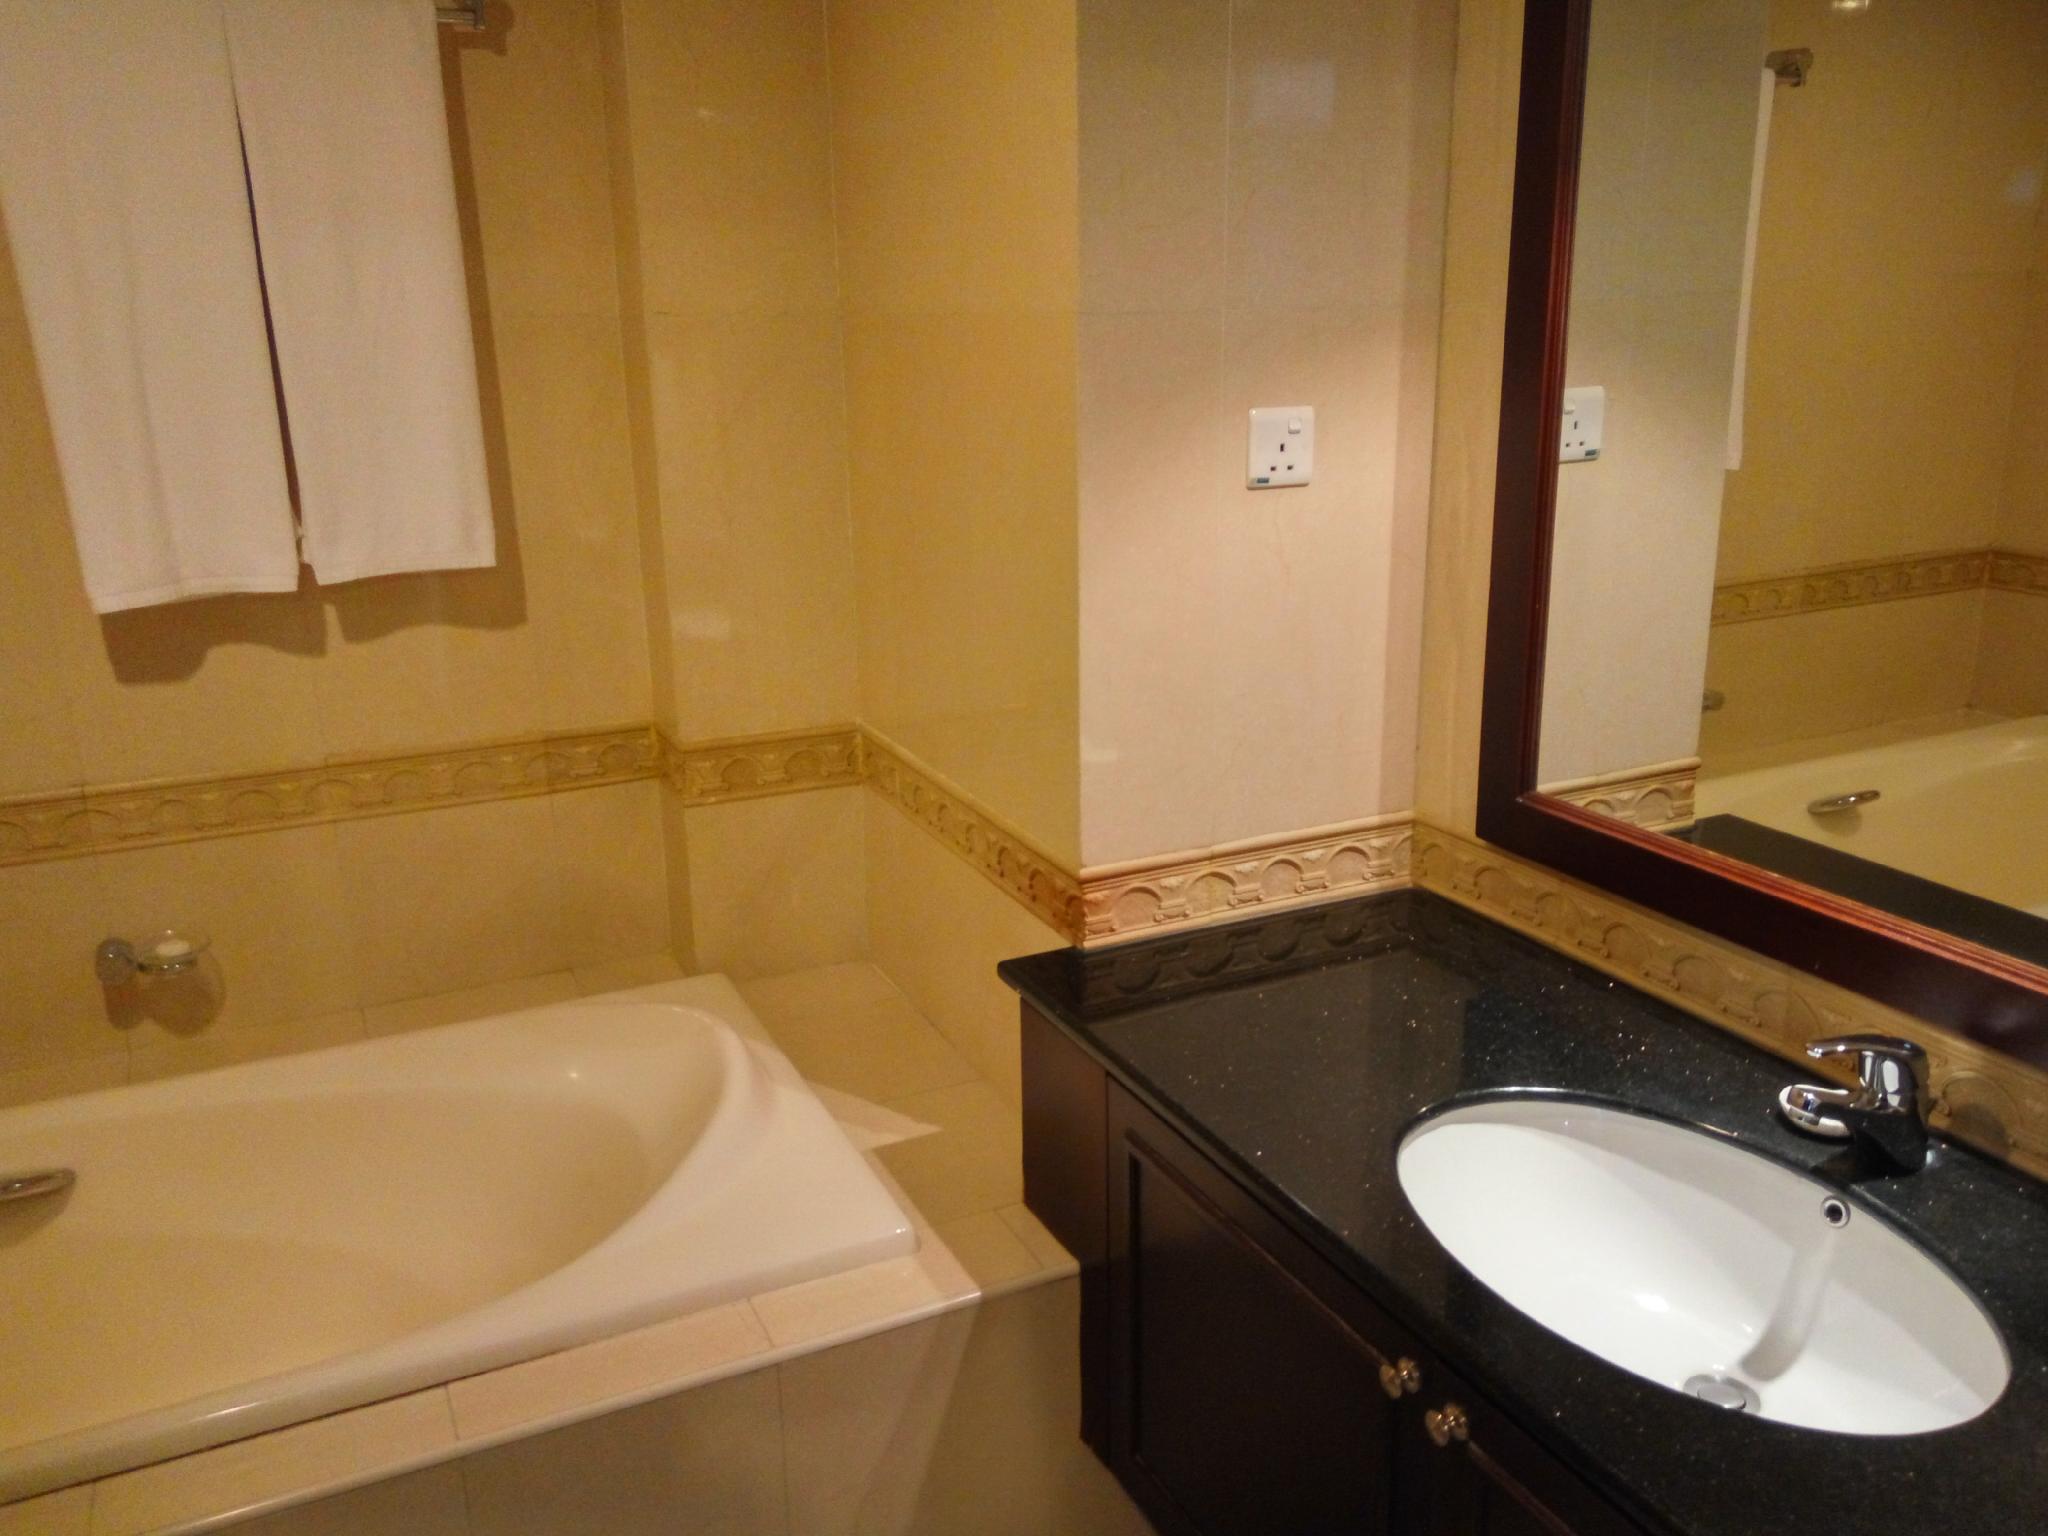 Espace Avenir Executive Serviced Apartment